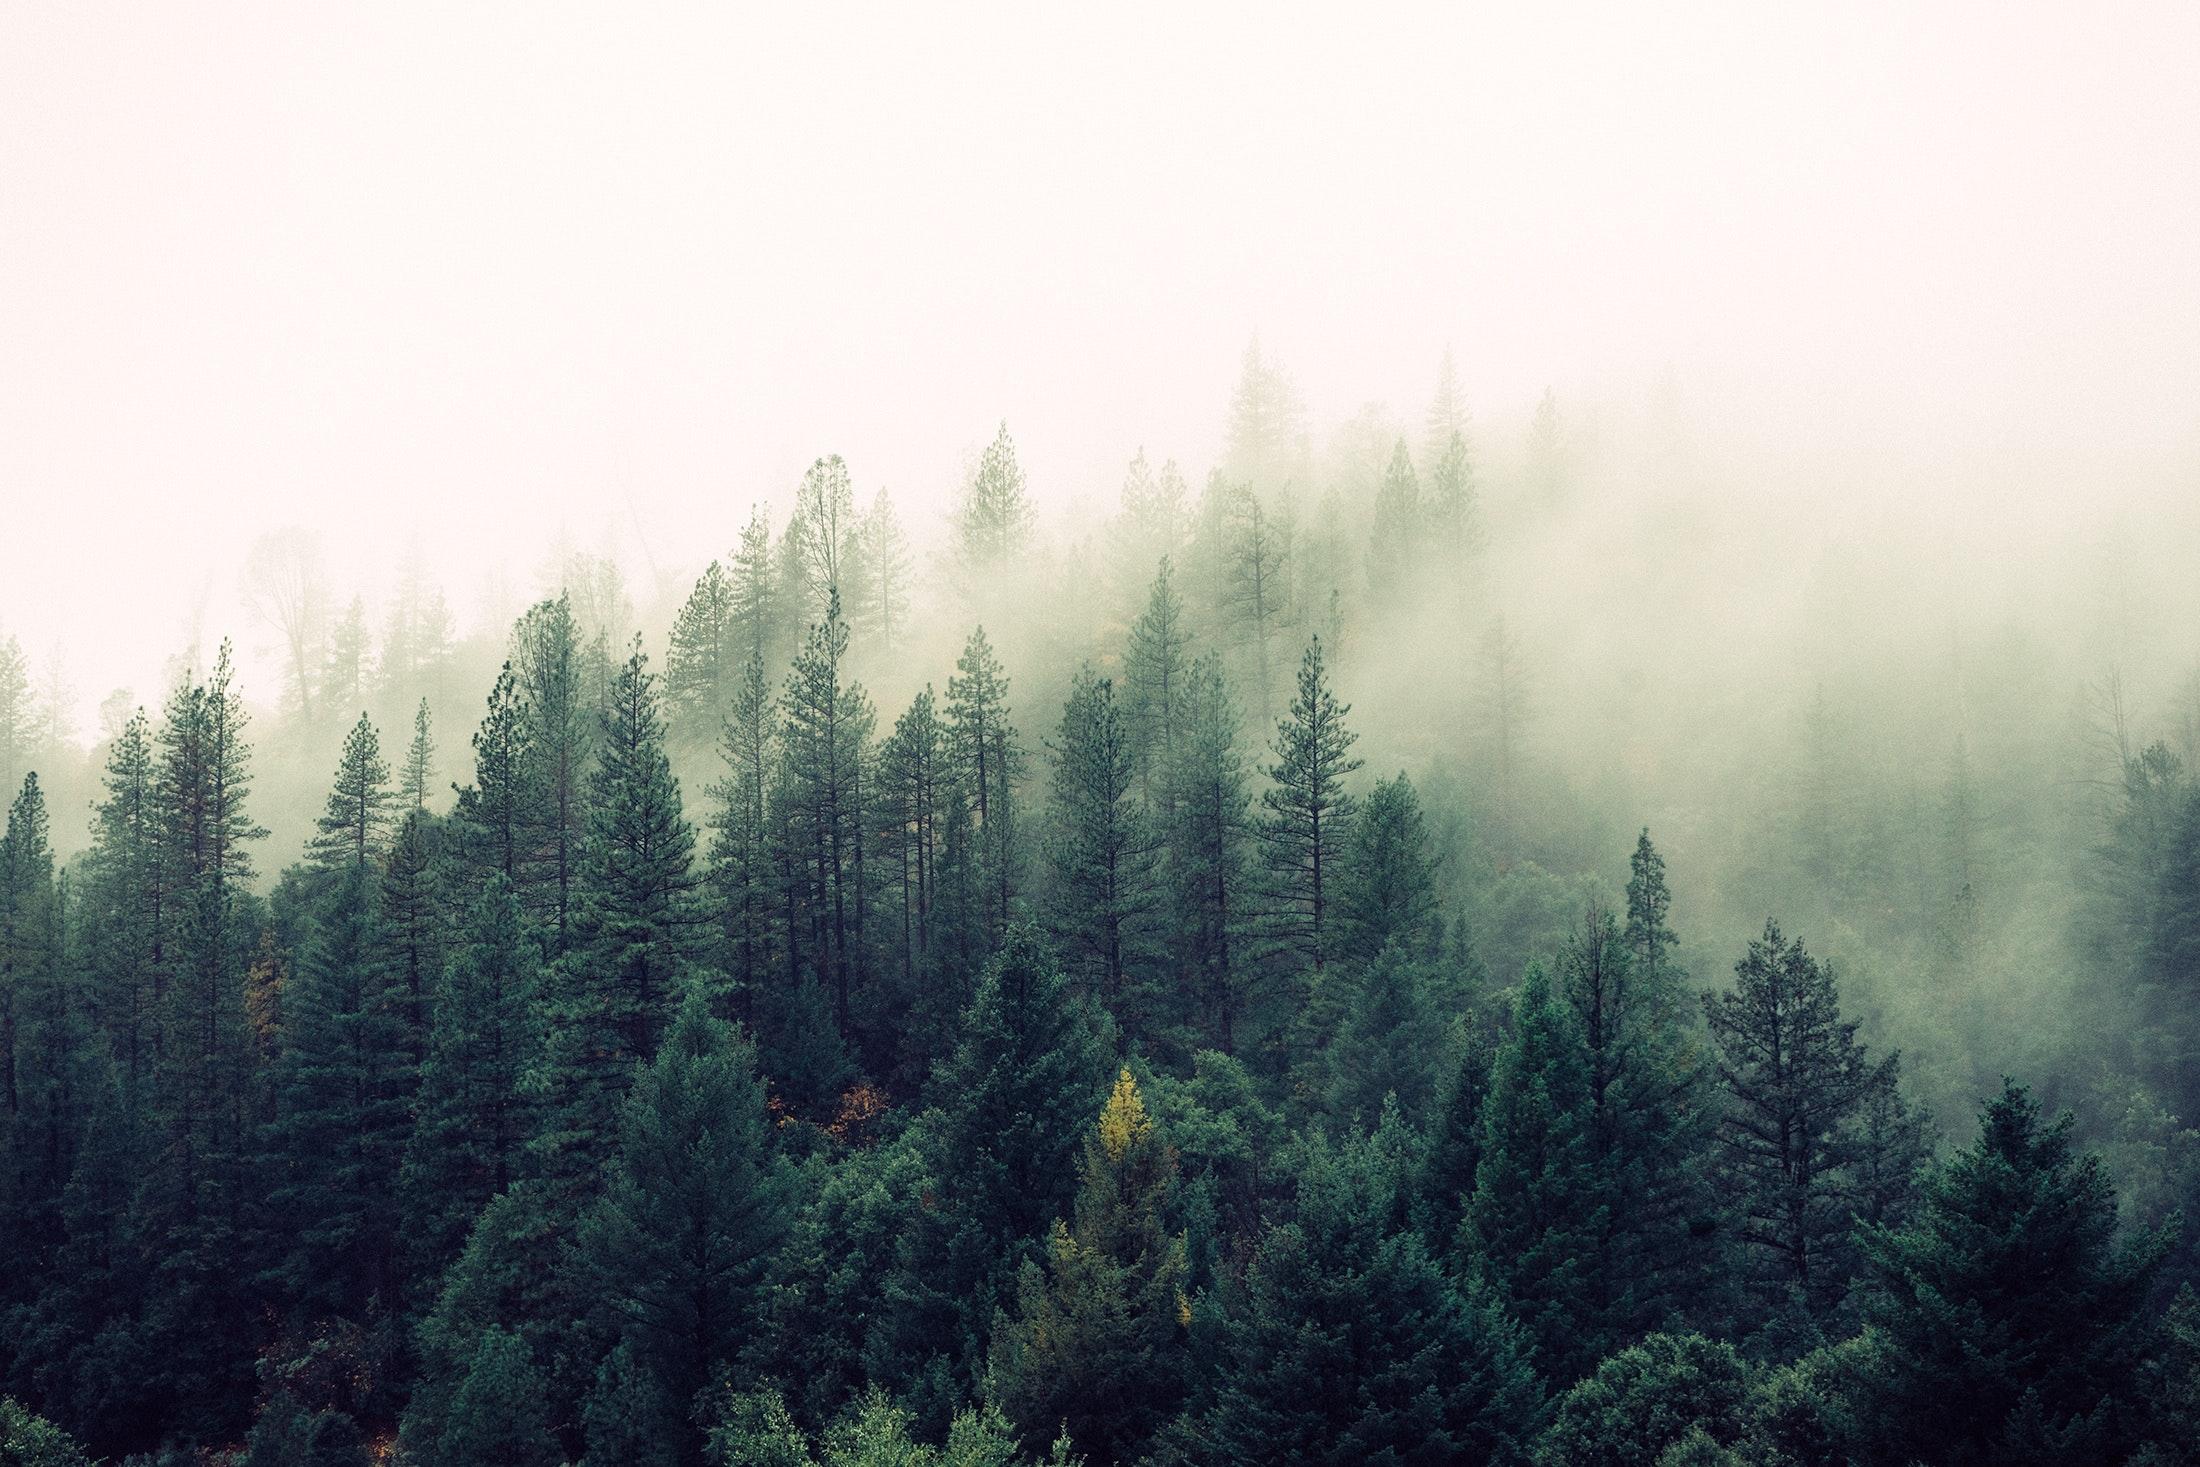 nature-forest-trees-fog.jpeg?cs=srgb&dl=pexels-4827.jpg&fm=jpg